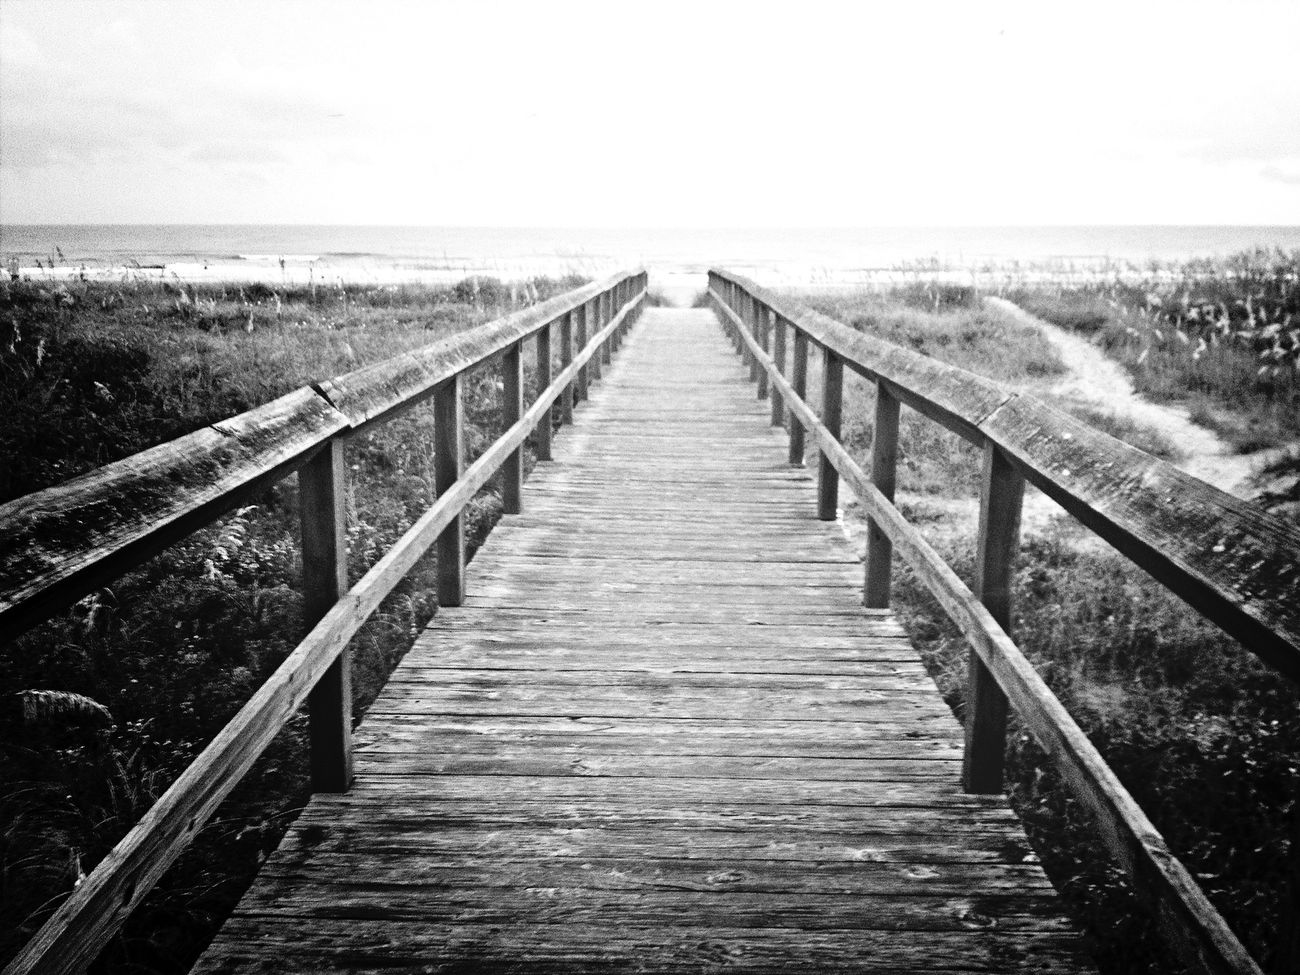 gratuitous beach walkway shot! EyeEm Best Shots Eye4photography  EyeEm EyeEm Best Shots - Black + White